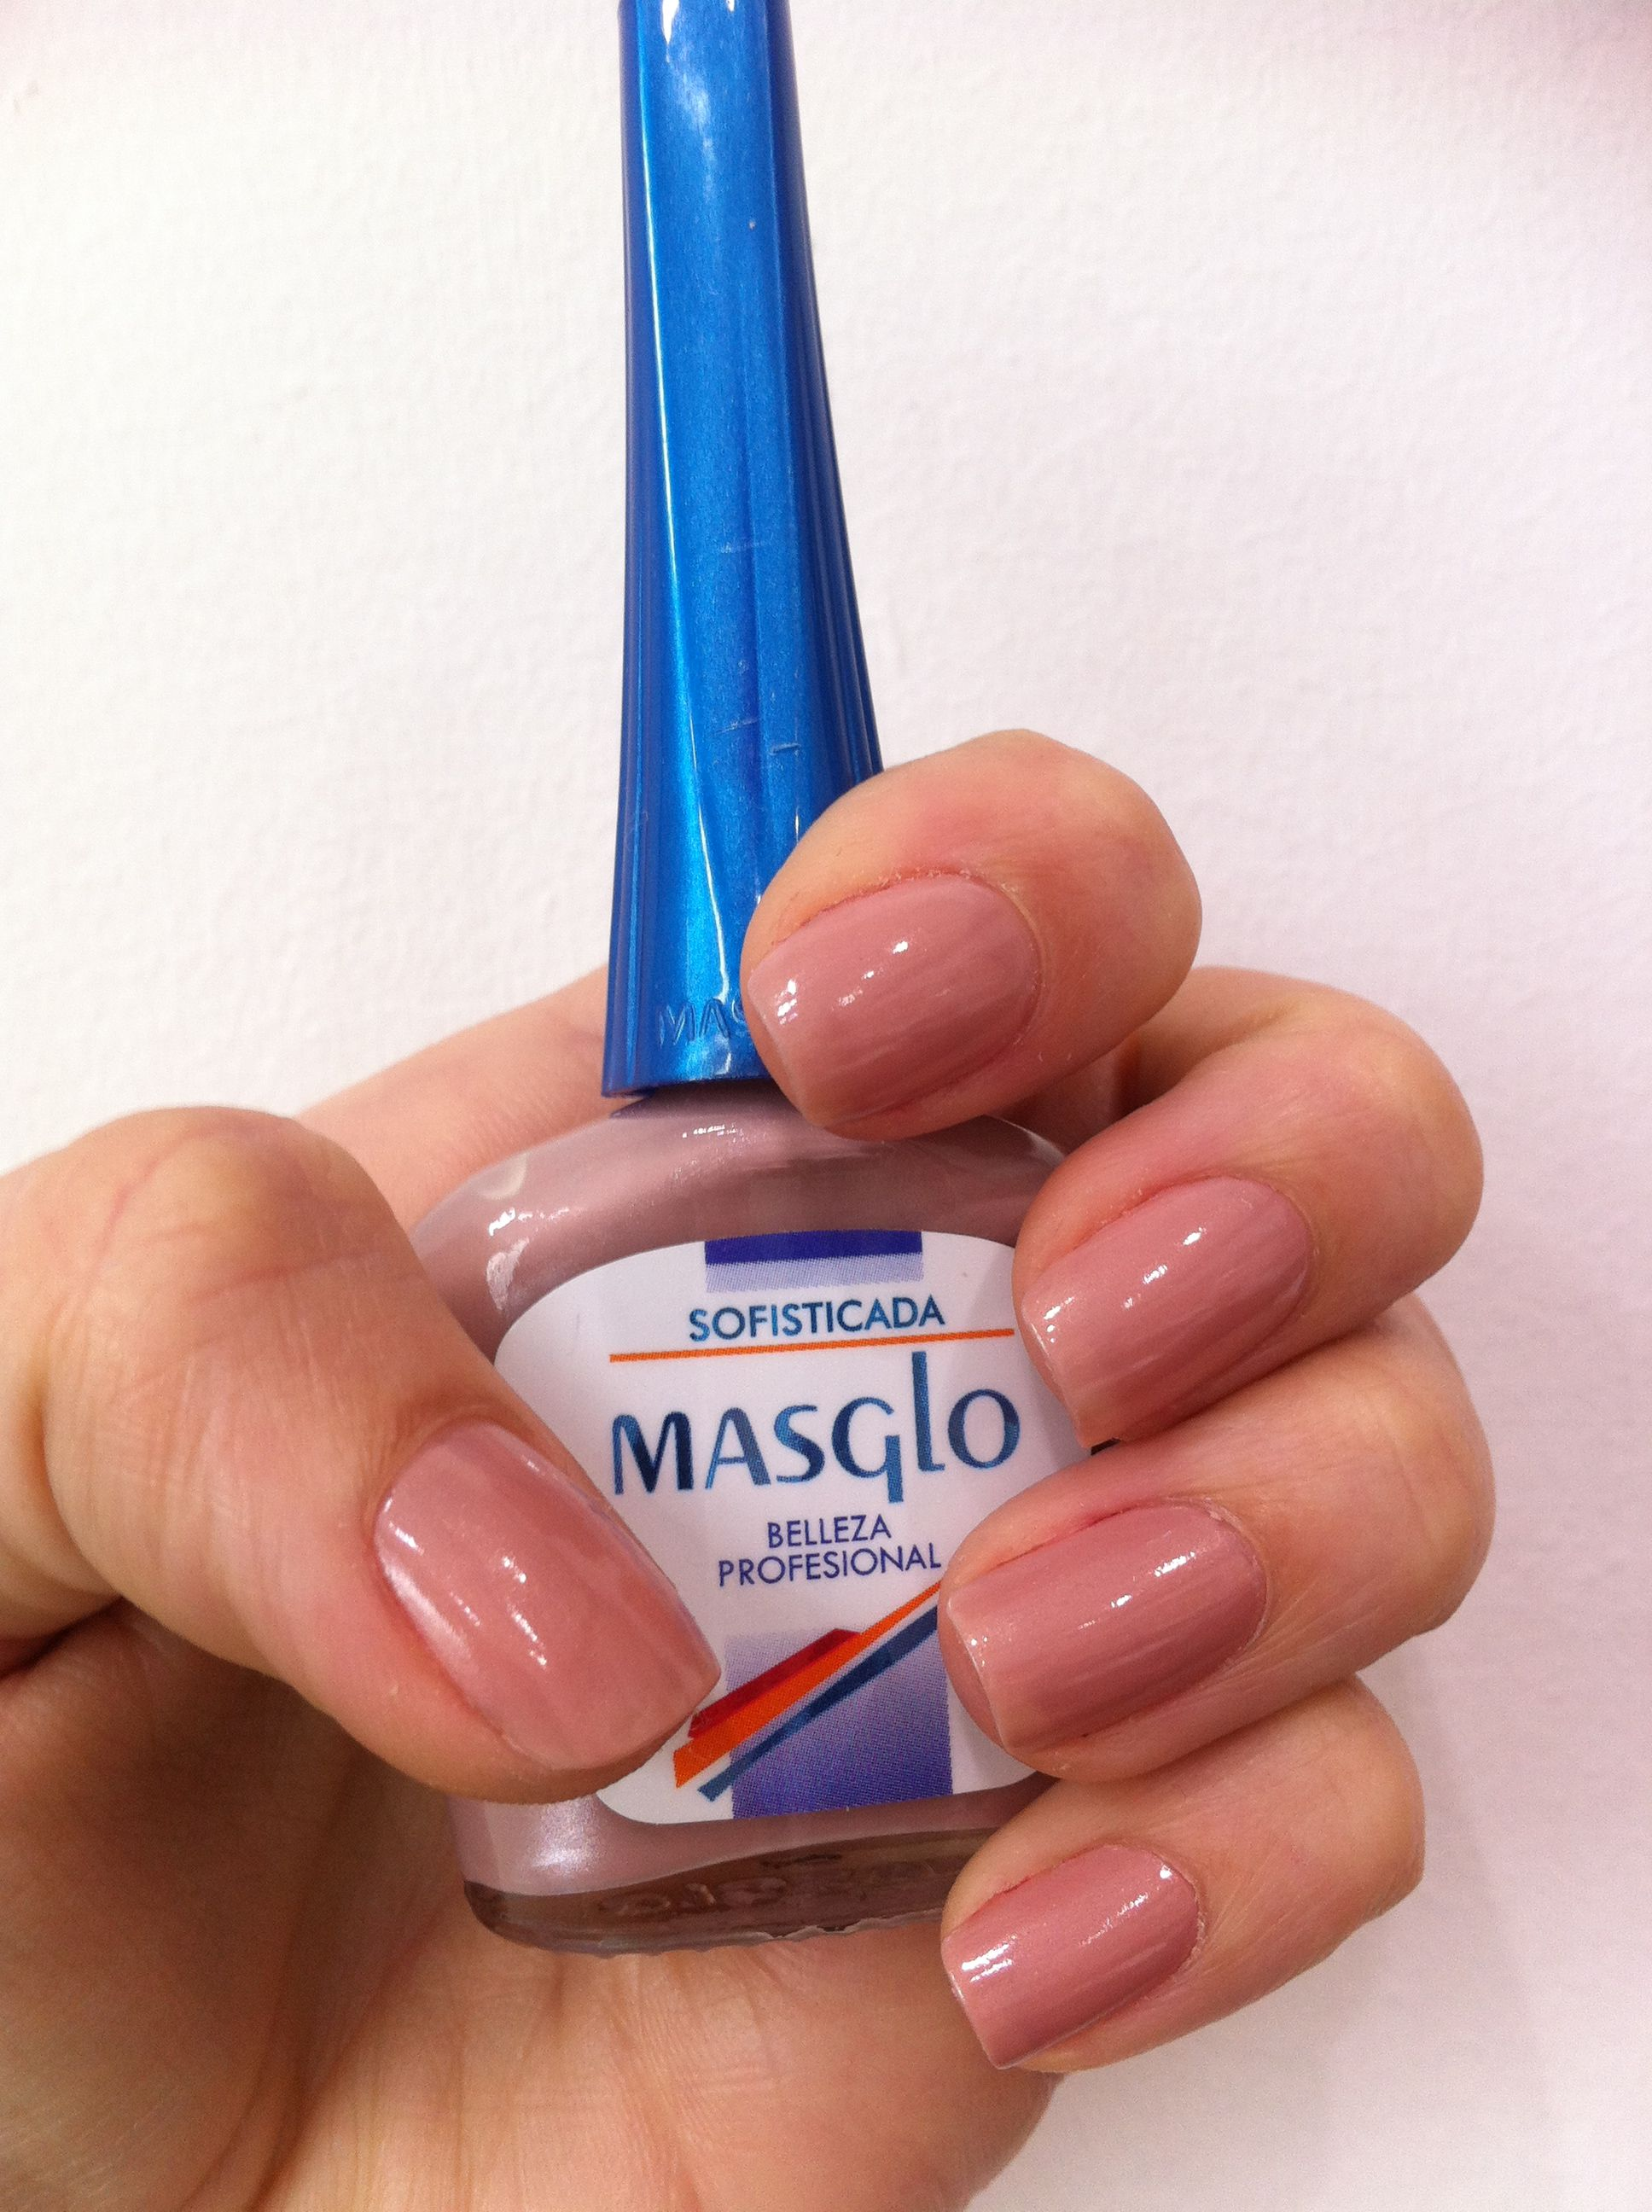 Sofisticada con Masglo. Masglo Nails | esmlates | Pinterest | Manicure